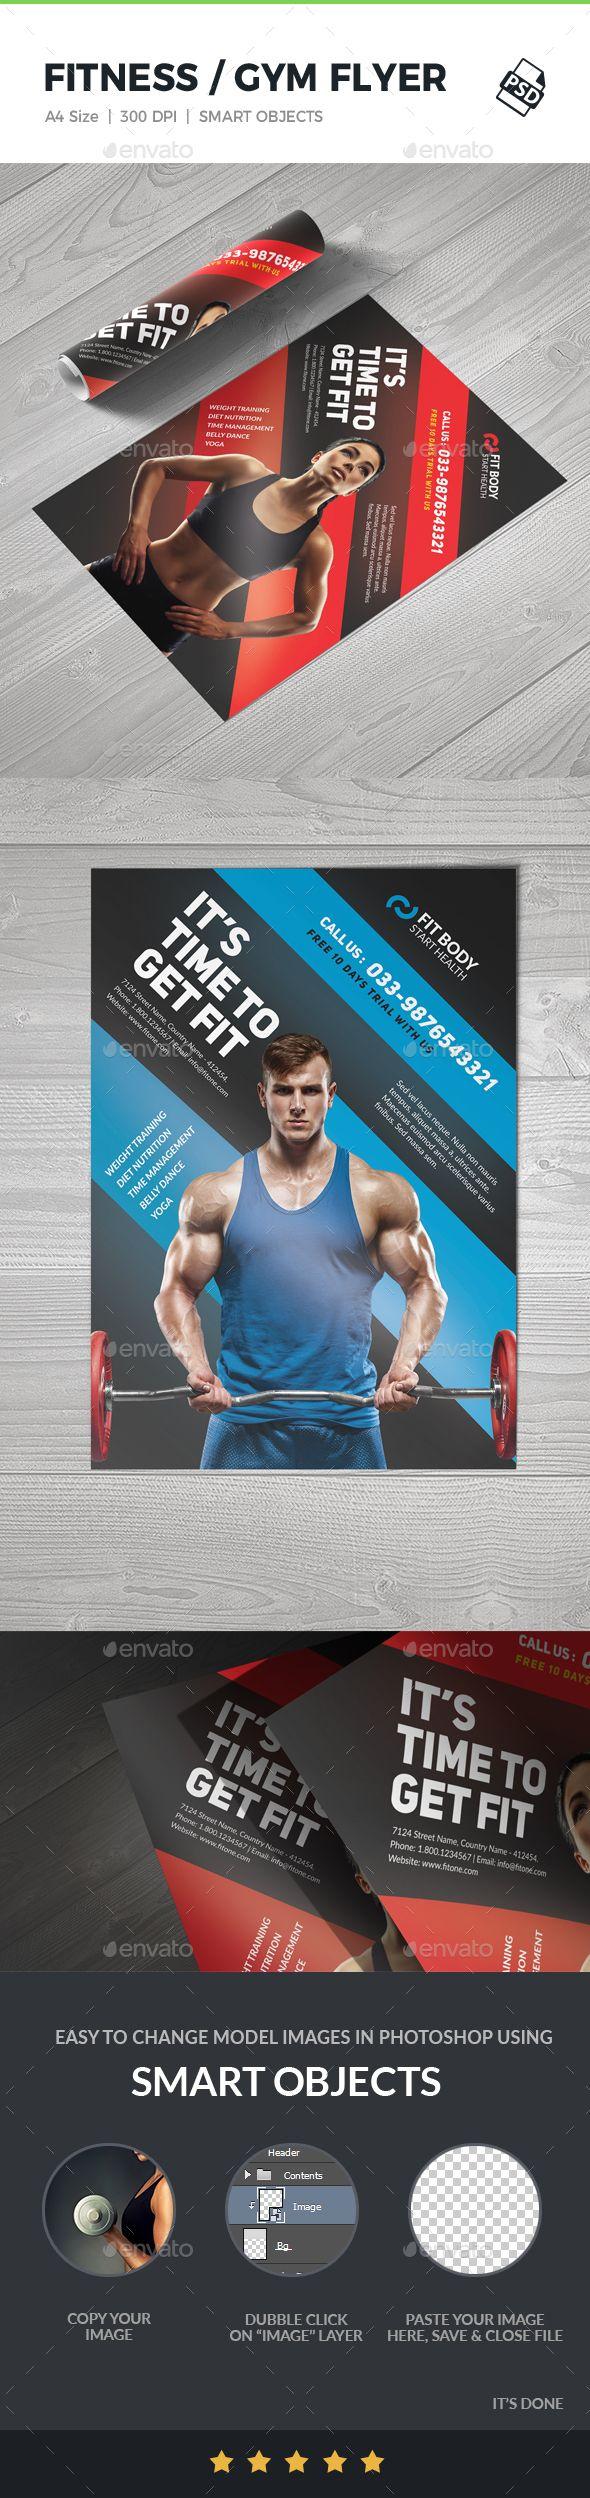 Healthcare-Advertising-FitnessFlyer-Sports-Events Healthcare Advertising : #FitnessFlyer - Sports Events